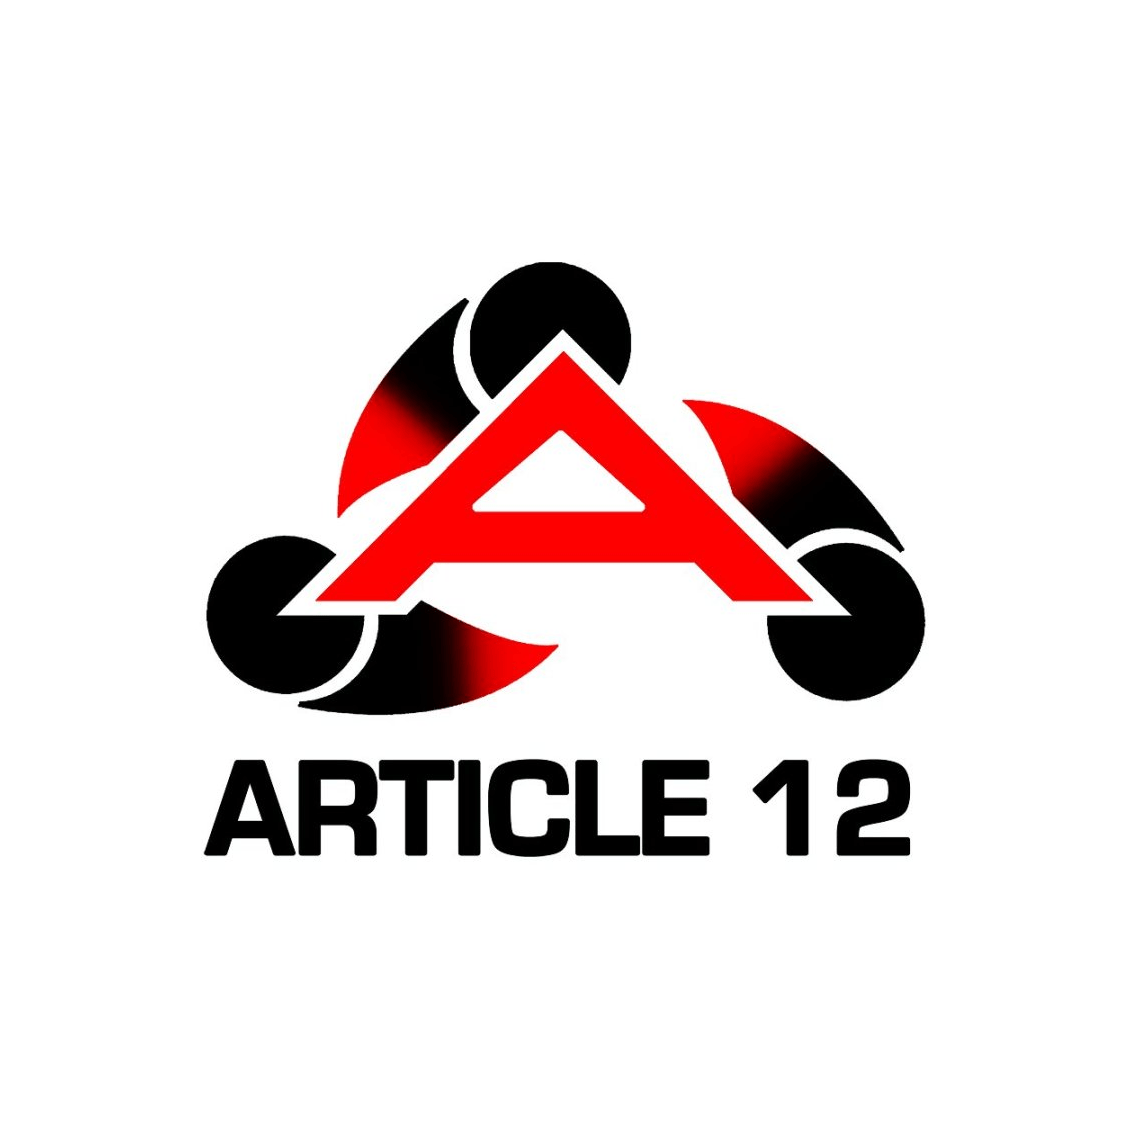 Article 12 in Scotland